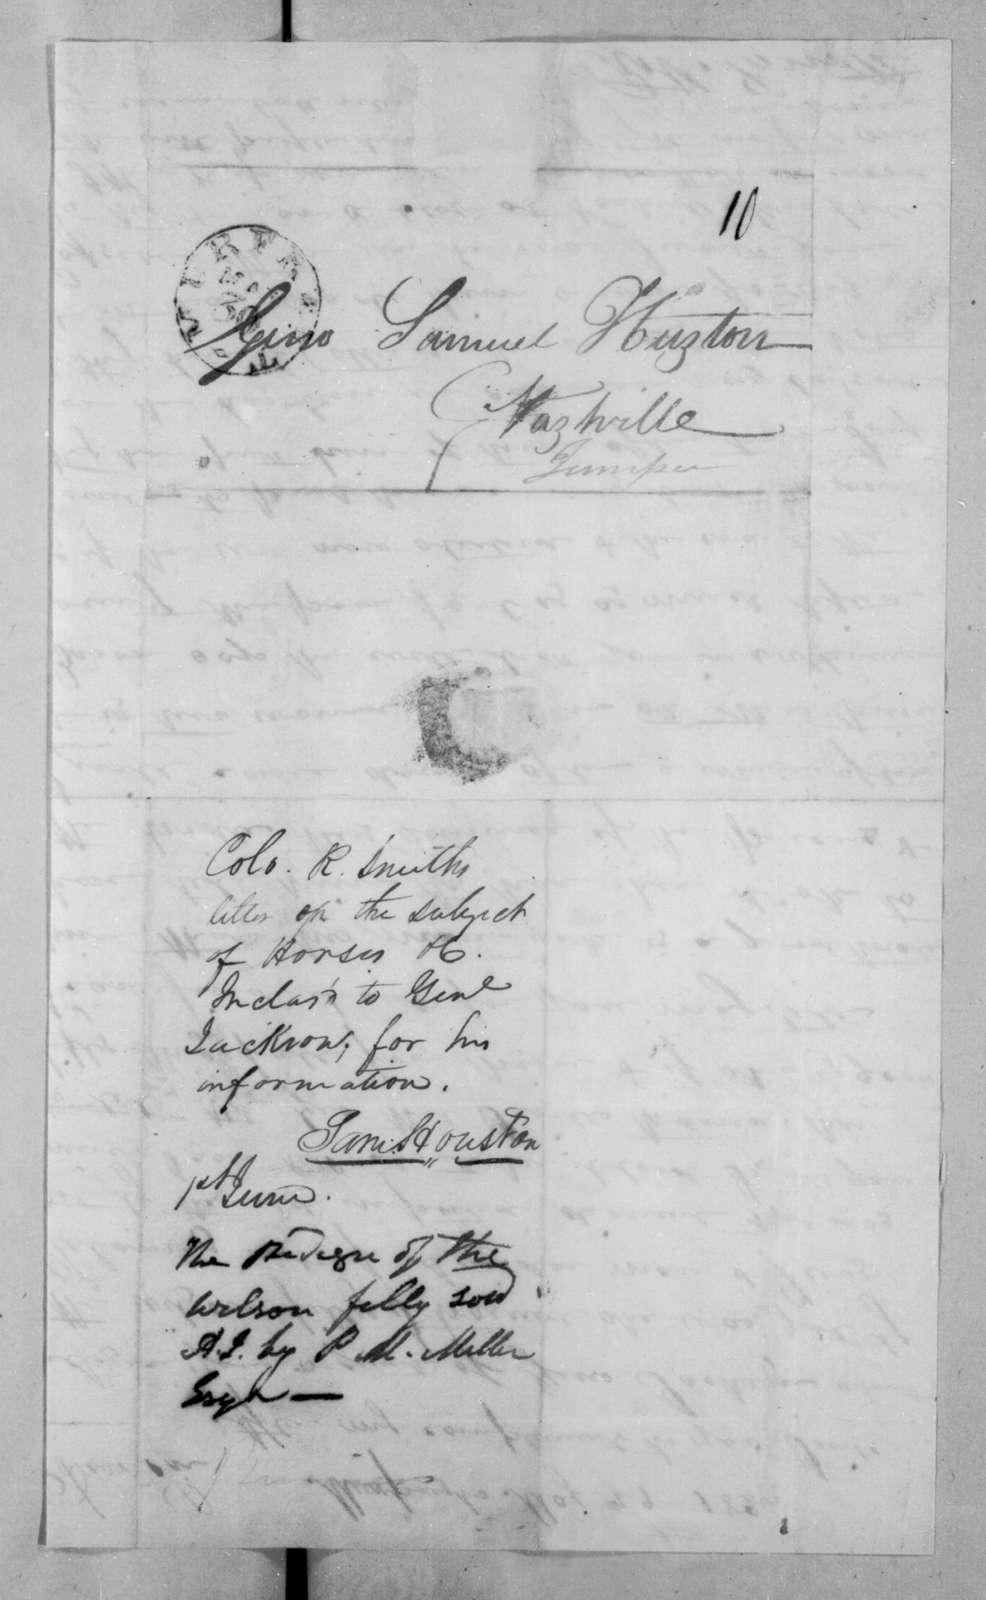 Robert Smith to Samuel Houston, May 29, 1825